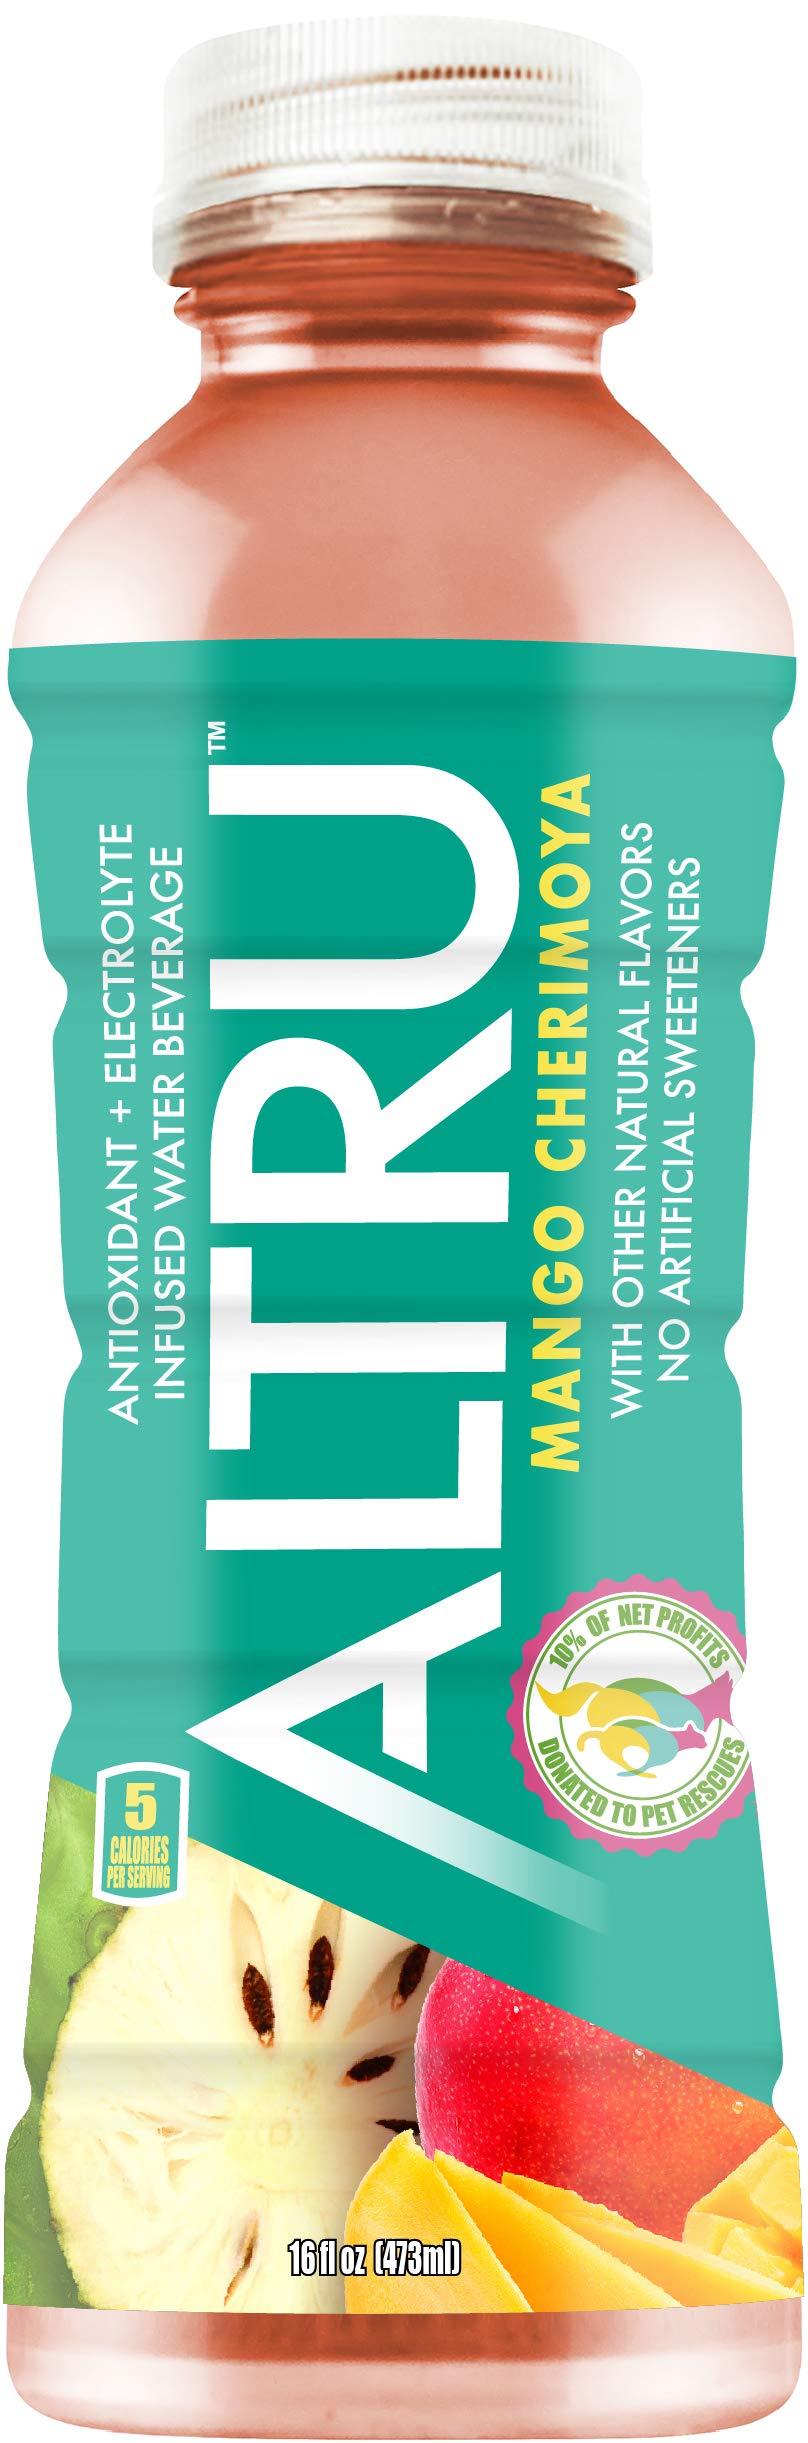 ALTRU Mango Cherimoya - 12 pack (16 ounce) bottles - The Mother of all Antioxidant Drinks by ALTRU